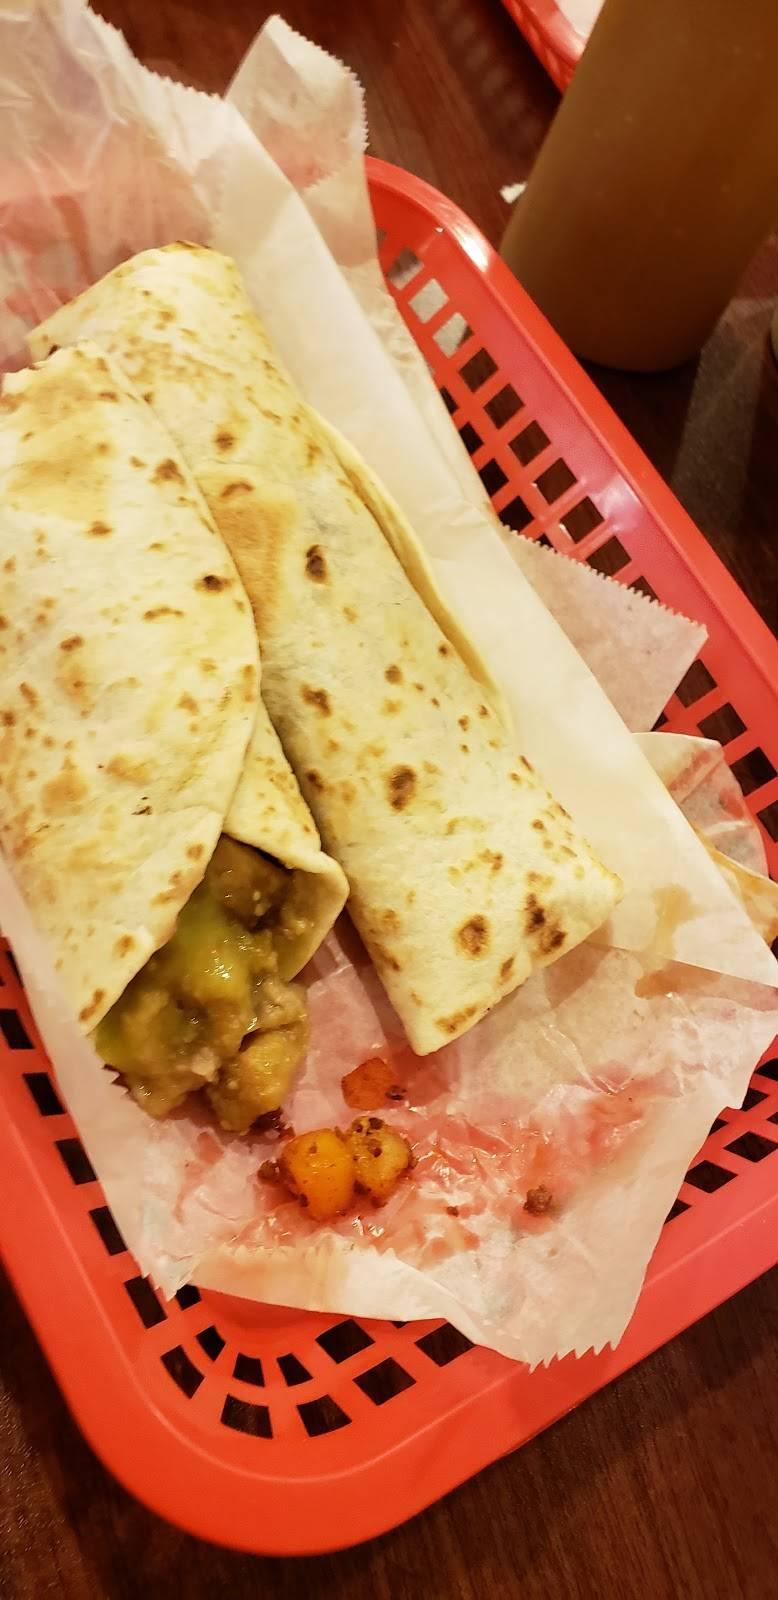 Burritos Juarez | restaurant | 5935 S Pulaski Rd, Chicago, IL 60629, USA | 7733062314 OR +1 773-306-2314